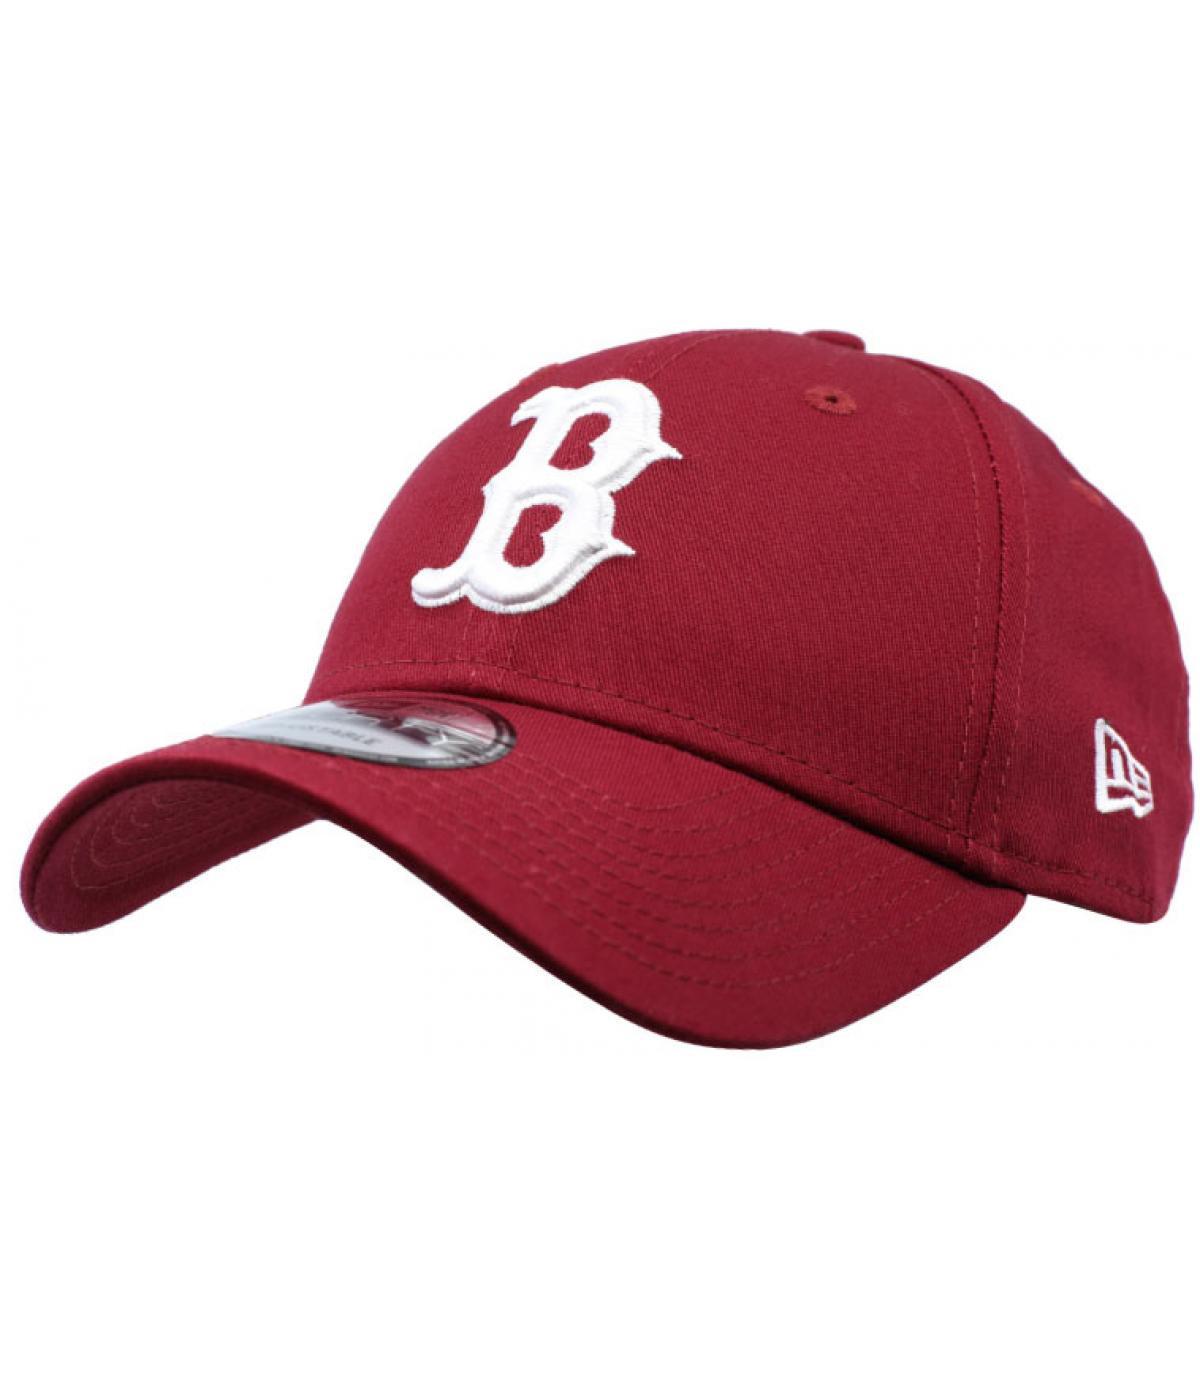 Dettagli League Ess 9Forty Boston cardinal - image 2